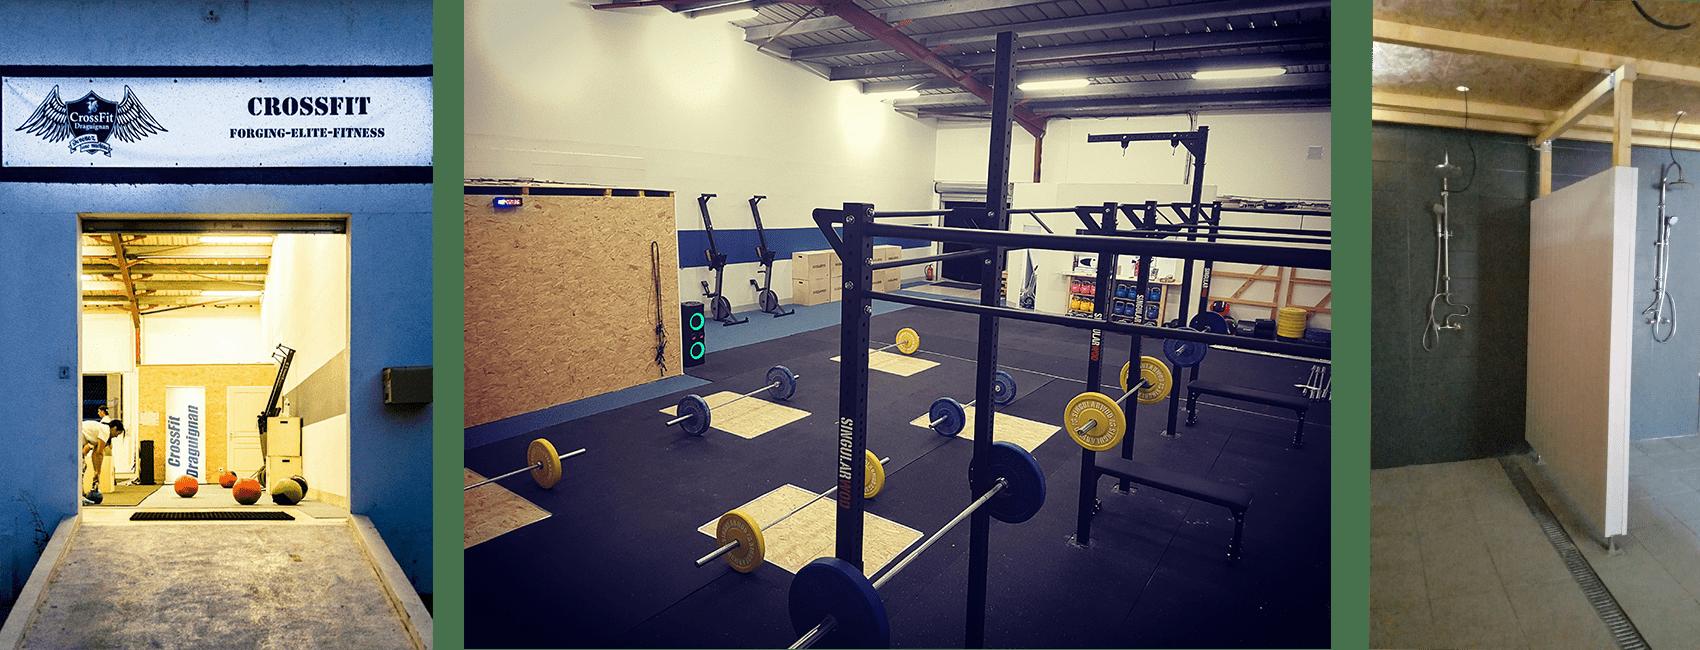 salle de sport - CrossFit Draguignan